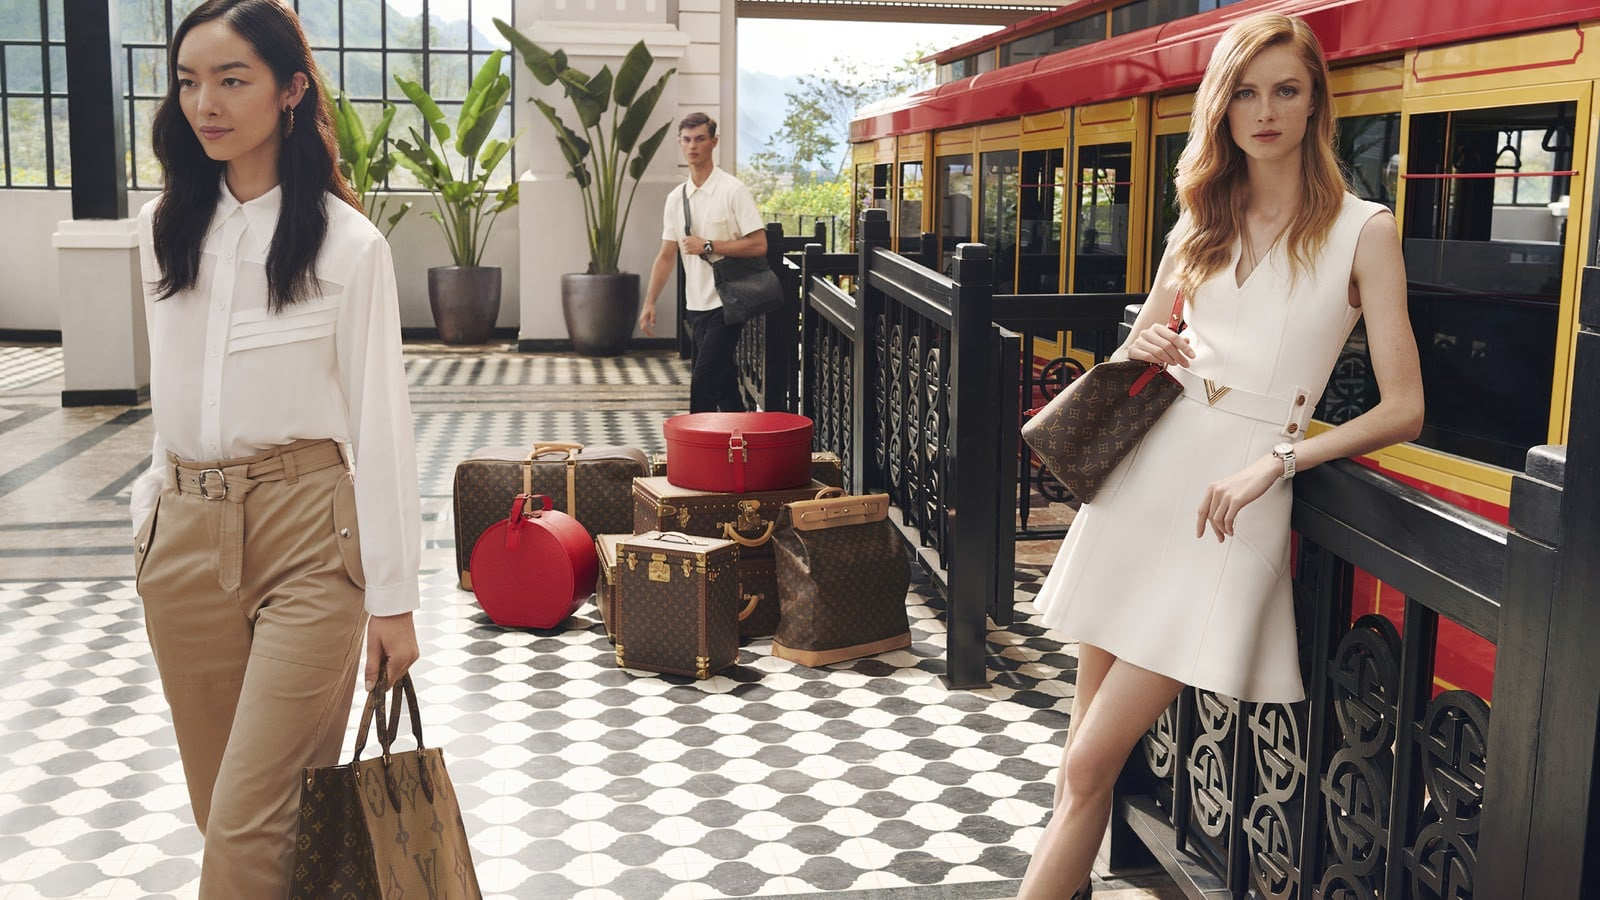 Chiến dịch Spirit of Travel của Louis Vuitton